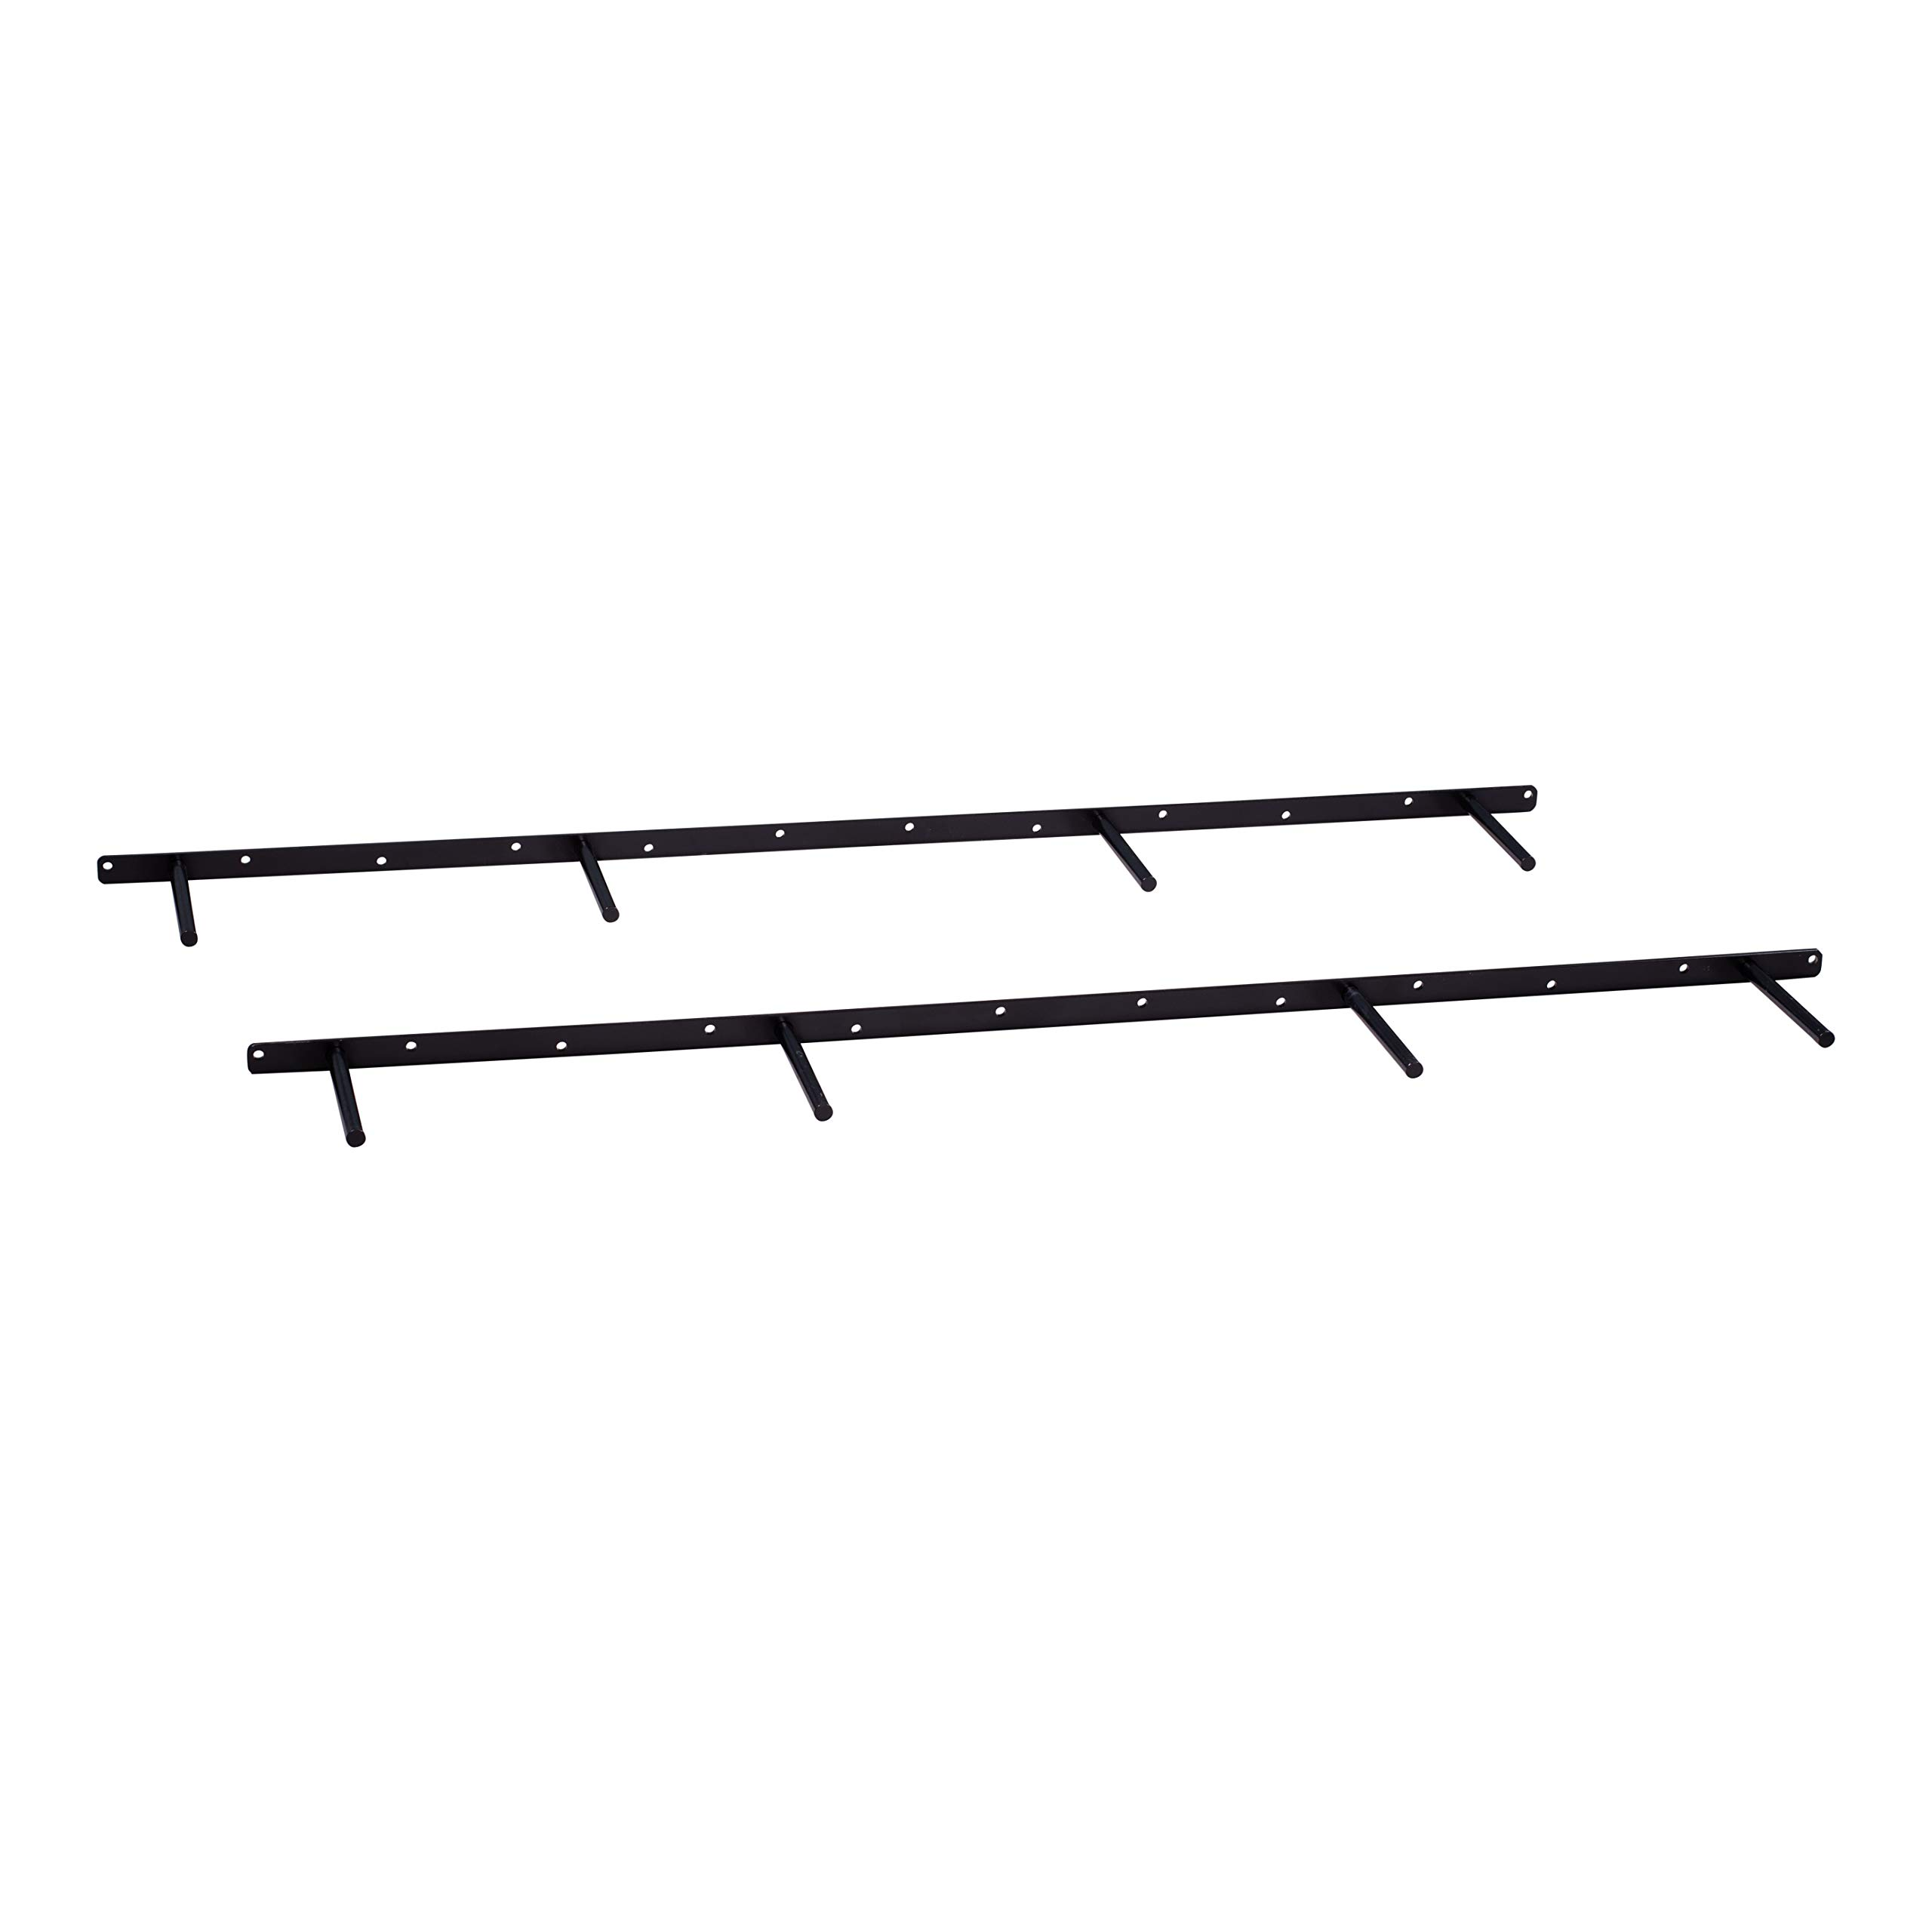 DAKODA LOVE 44'' Floating Shelf Brackets (Set of 2), for 46'' to 60'' Shelves, Made in USA, Uni-Bracket Blind Shelf Supports (44.625'' Long)